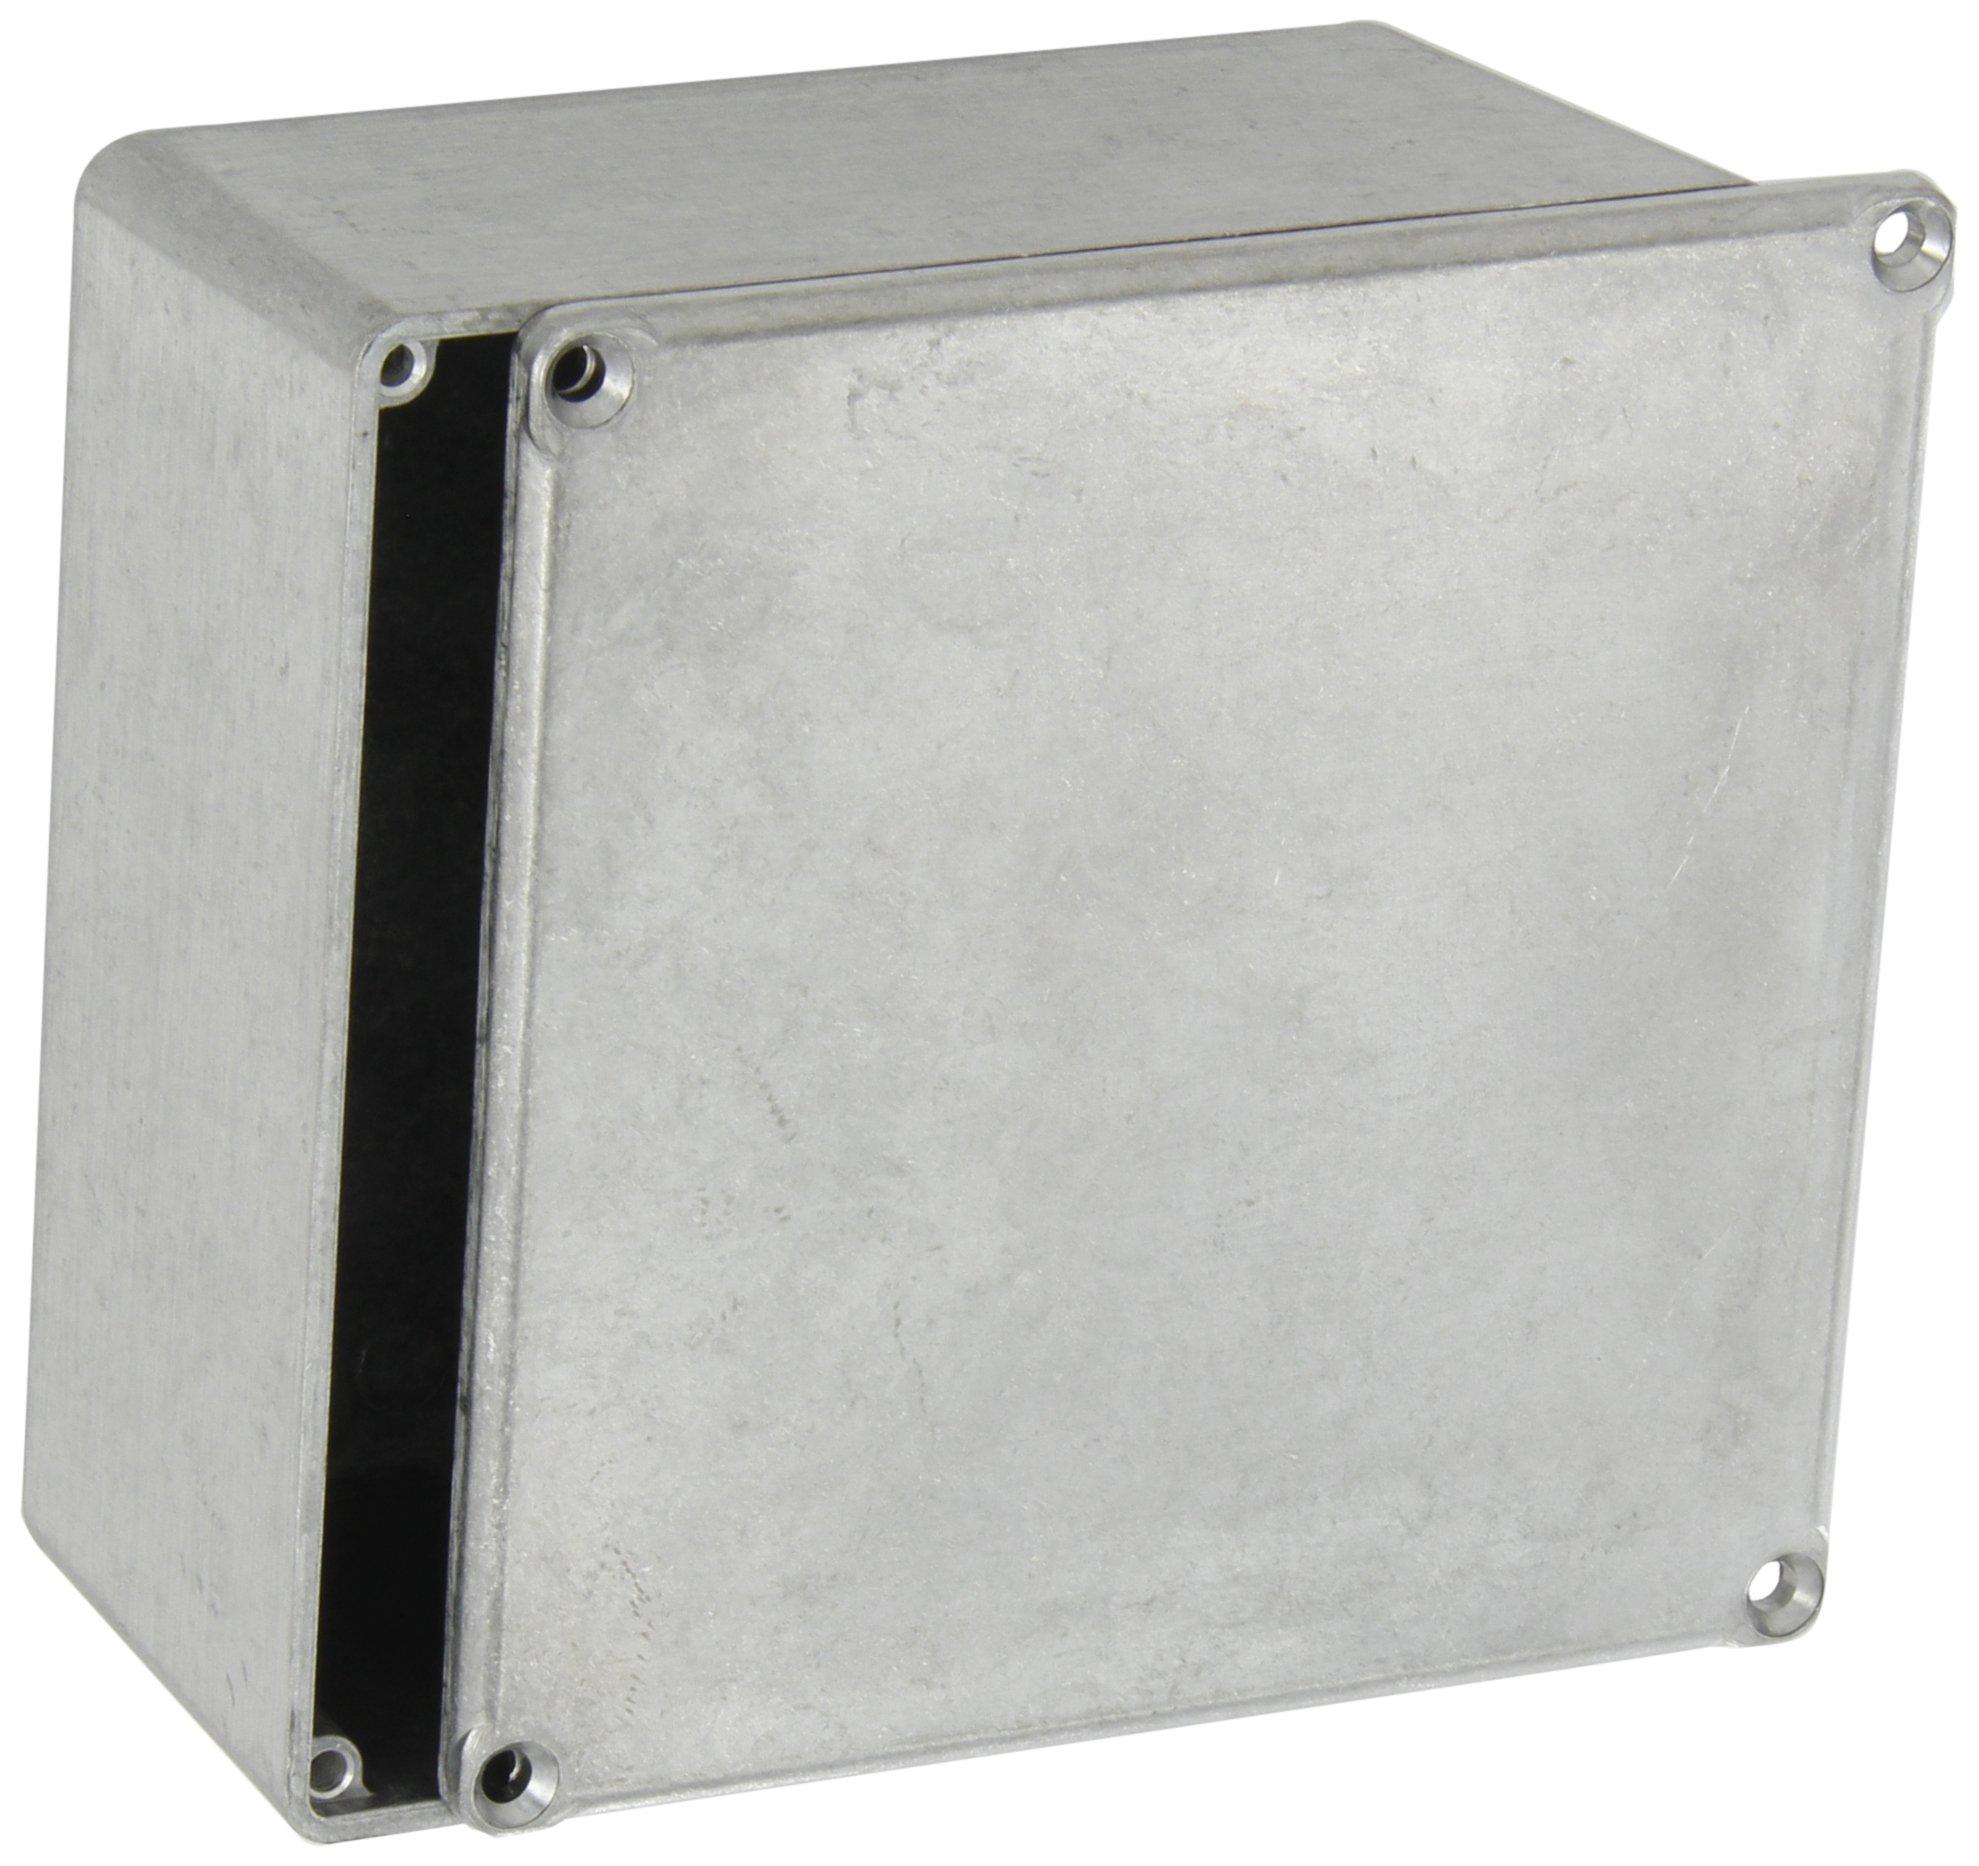 BUD Industries CU-474 Aluminum Econobox, 4-3/4'' Length x 4-3/4'' Width x 2-21/64'' Height, Natural Finish